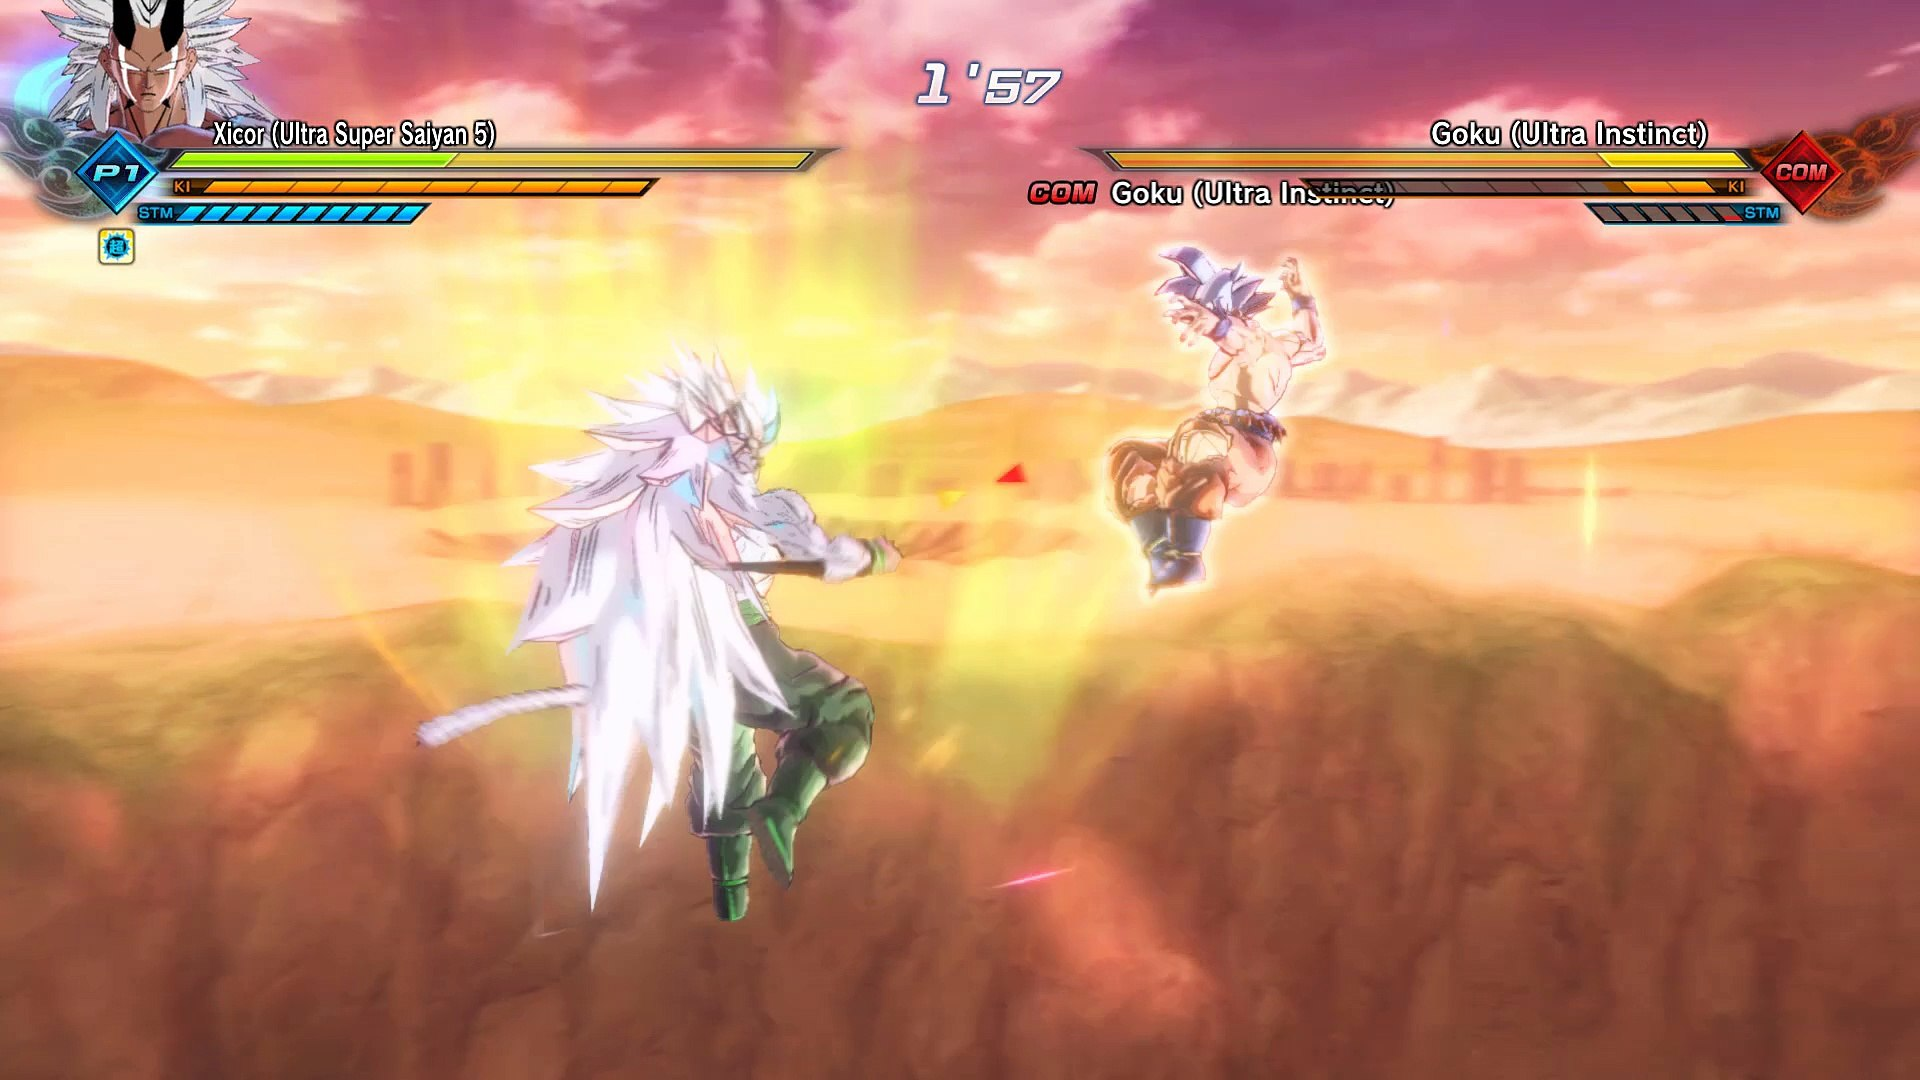 Xicor Ssj5 Vs Goku Mastered Ultra Instinct Video